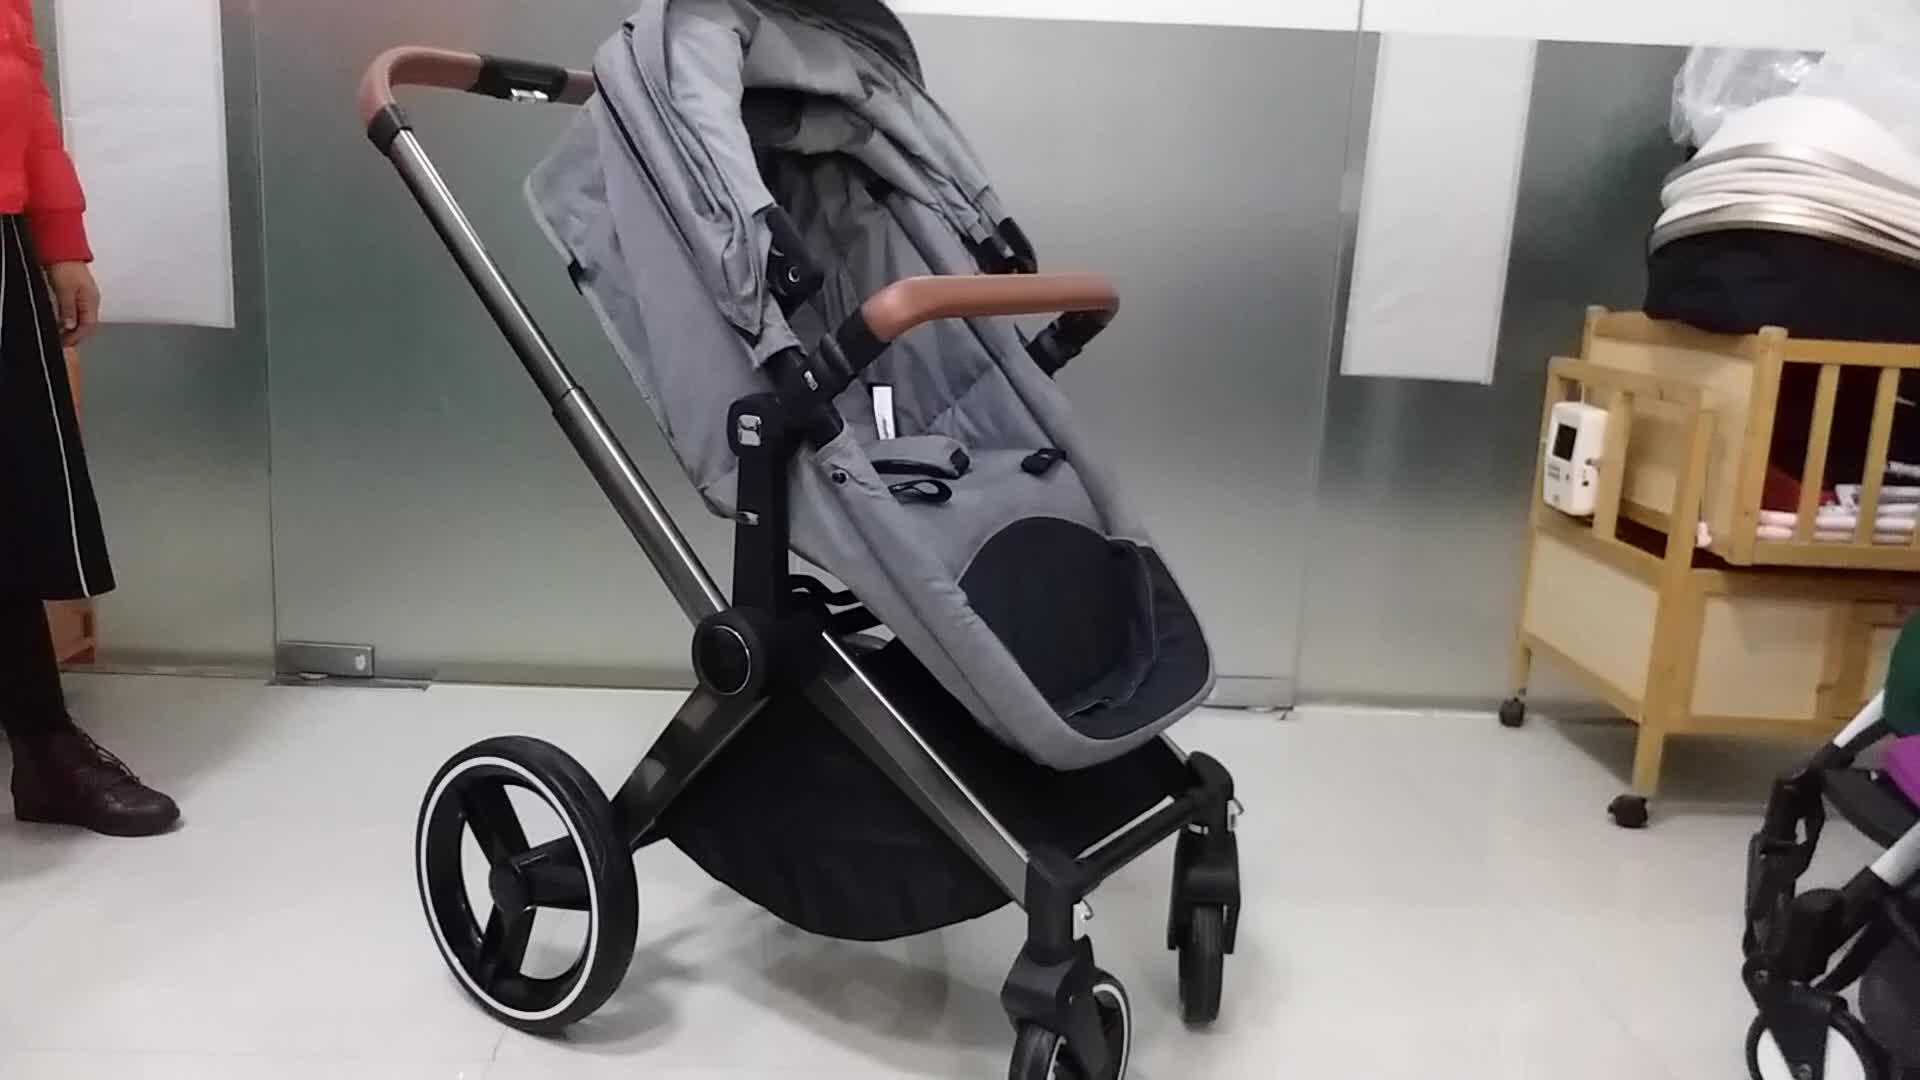 2018 Popular Big Wheels European Luxury Pram Stroller 3 in 1 For Baby